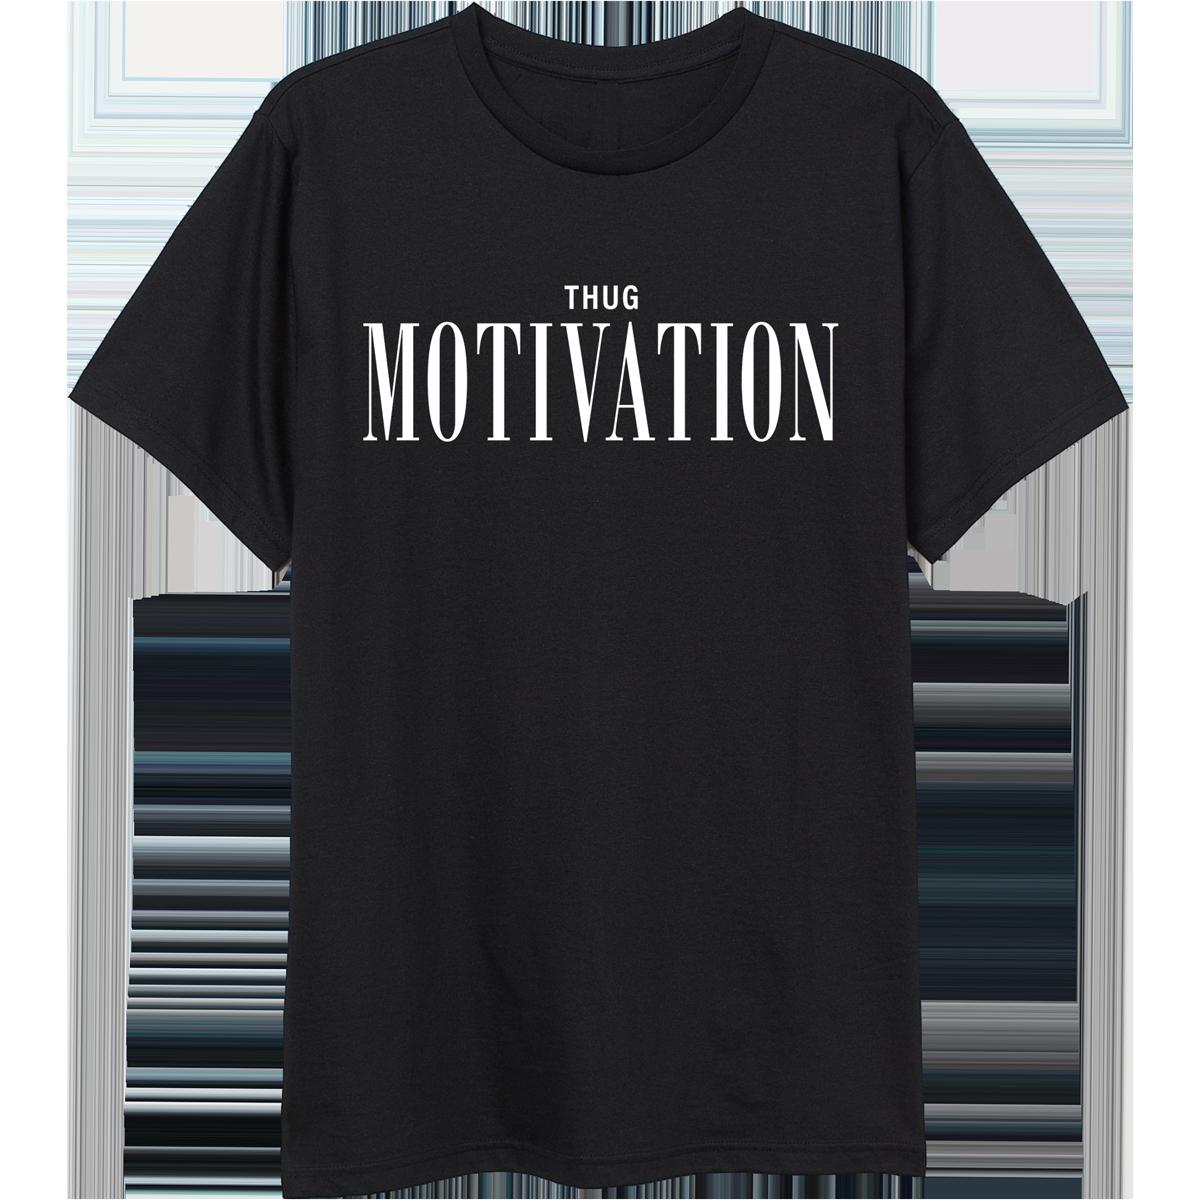 Thug Motivation Tee & TM104 Digital Download